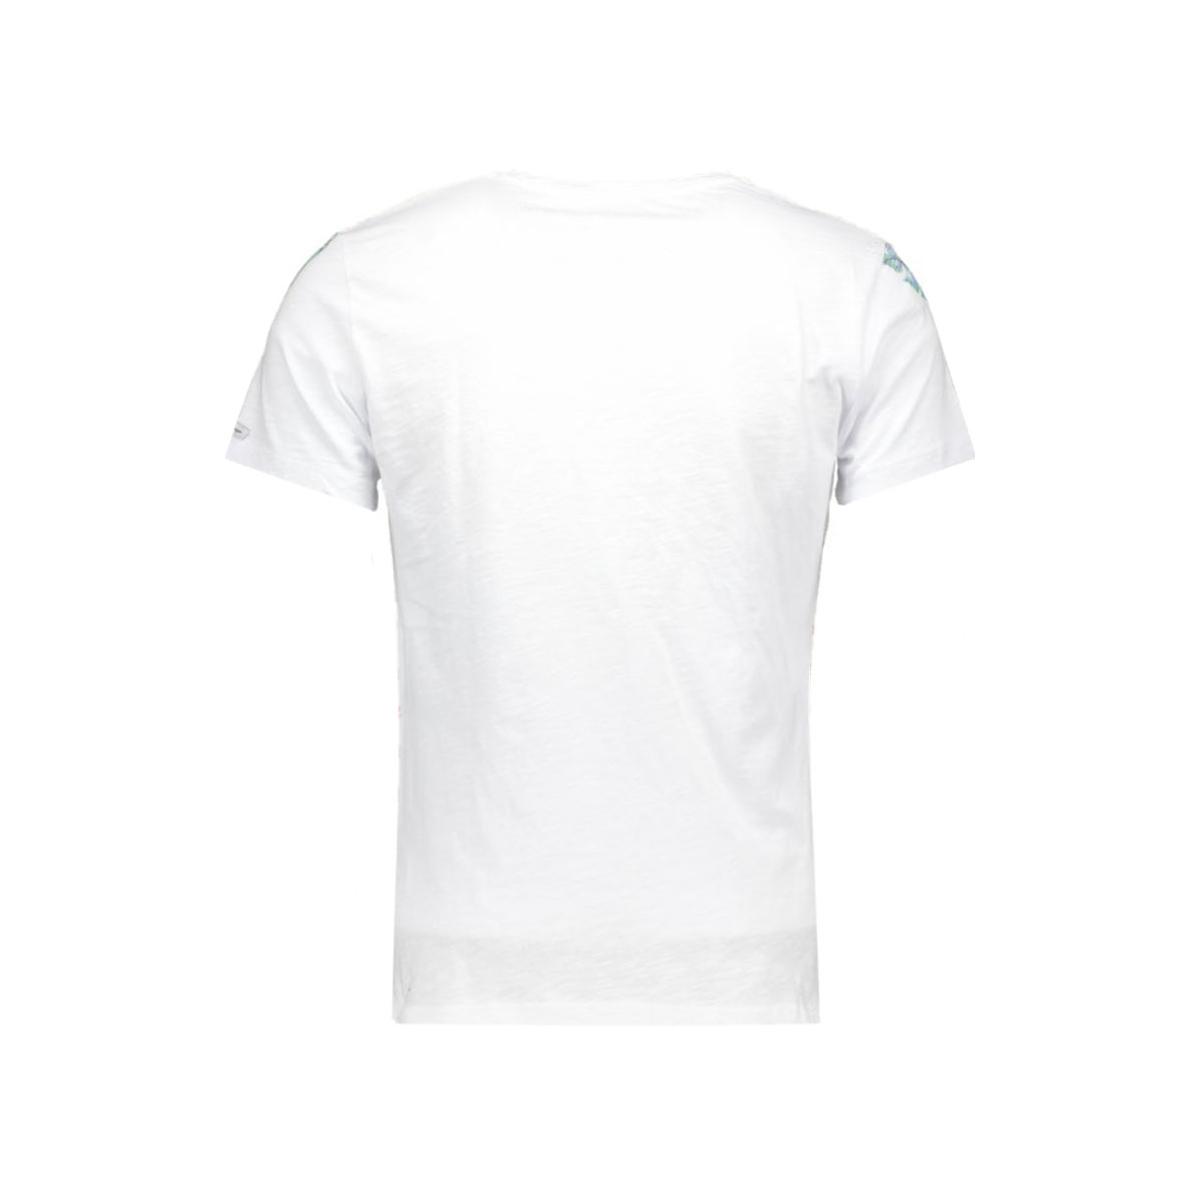 t00749 t palm tree key largo t-shirt 2008 white-red